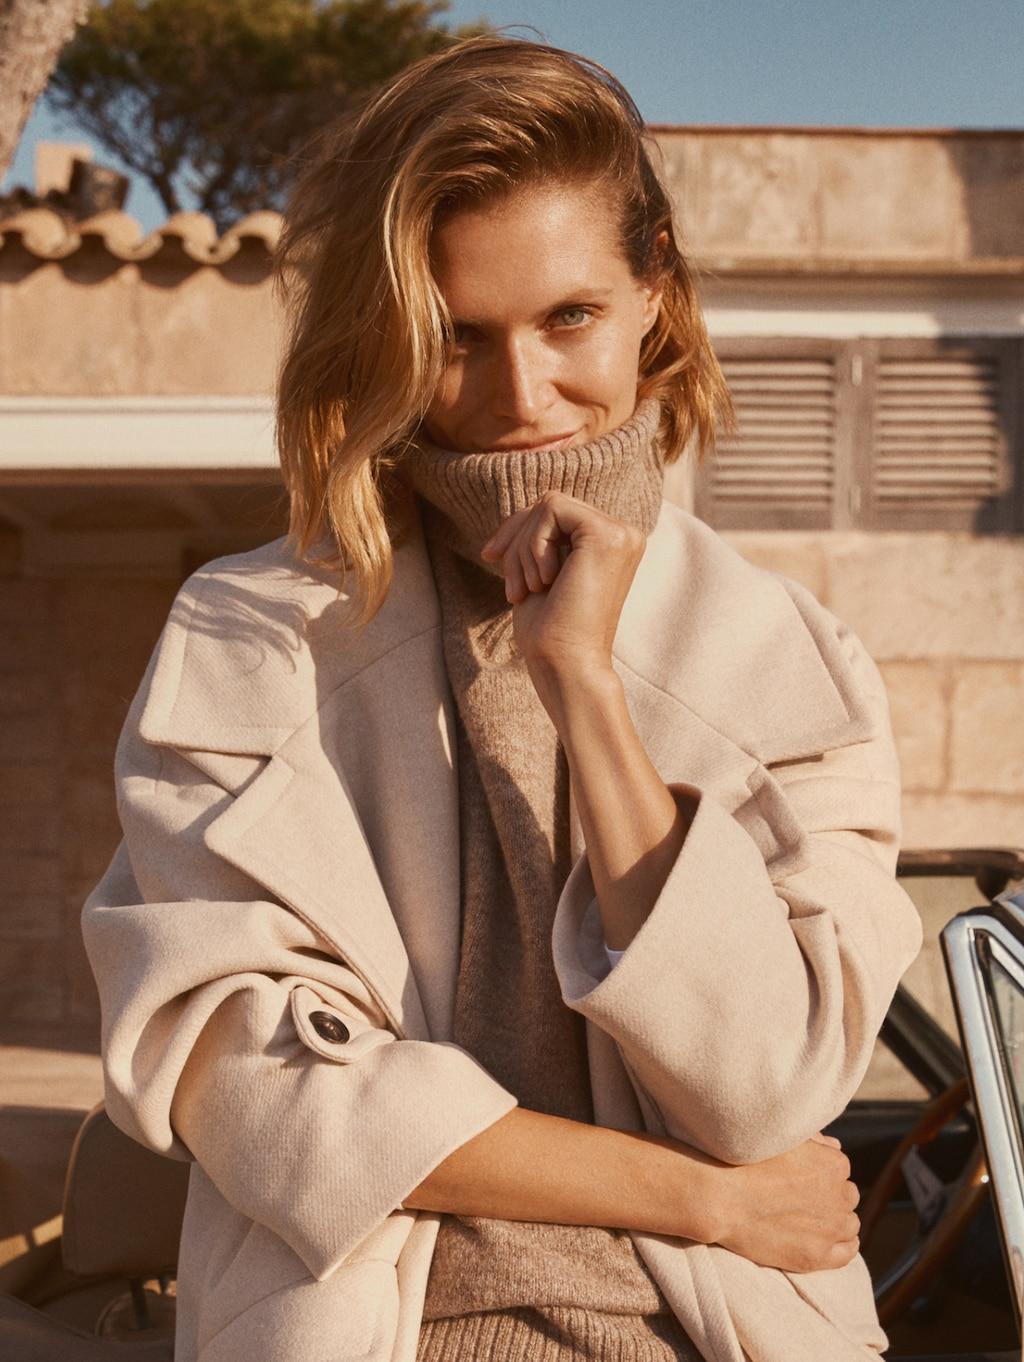 The (Mostly) Sustainable Autumn Capsule Wardrobe   crisp, romantic, beautiful wardrobe from sustainable brands   image source: Mango